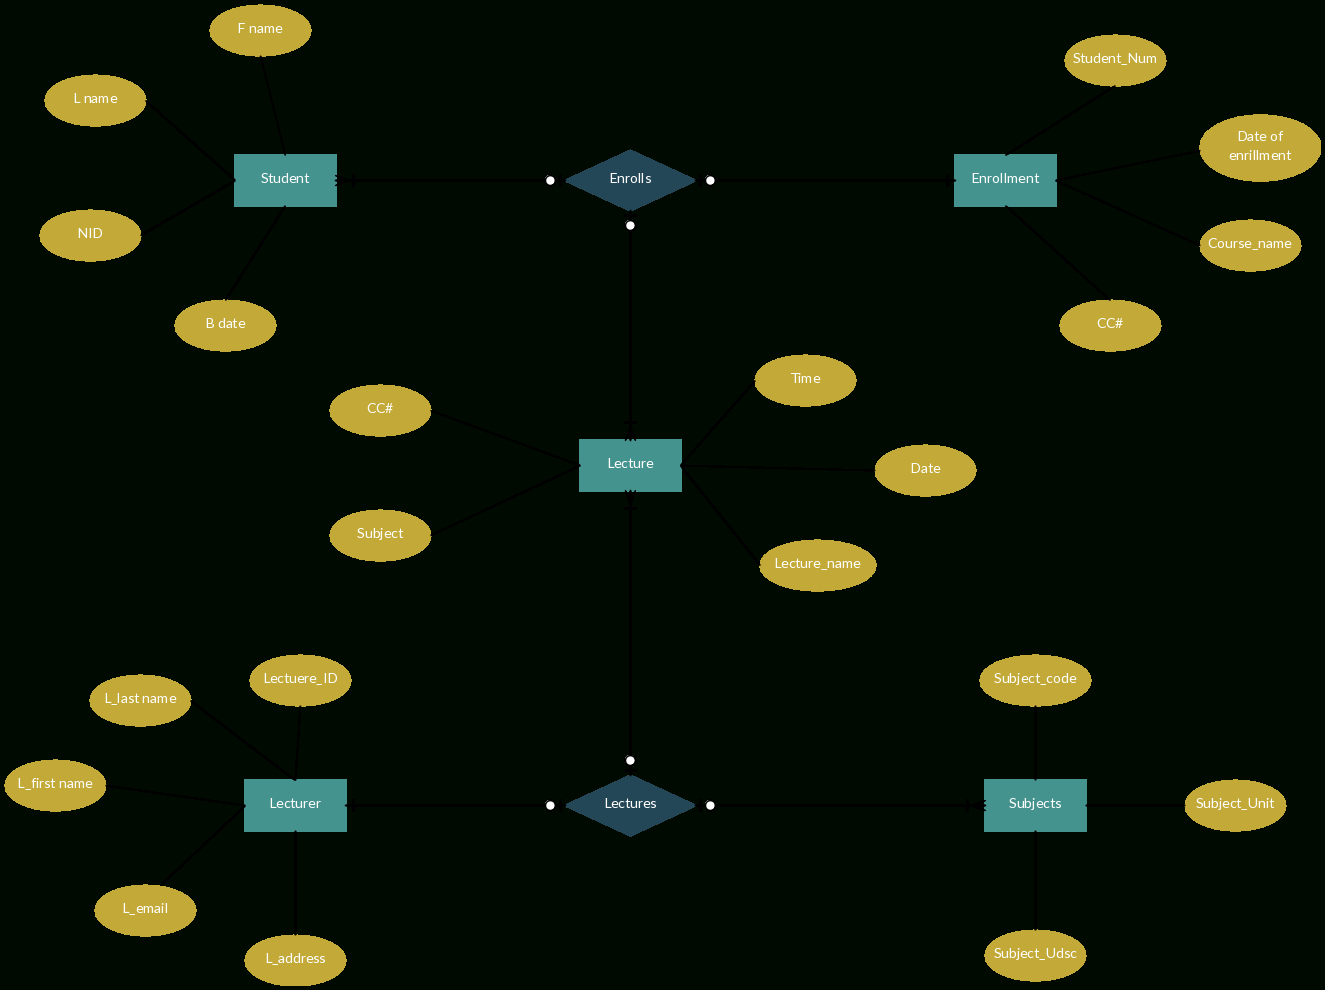 Entity Relationship Diagram For Collage Enrollment System | Online throughout Er Diagram Examples For Car Rental System